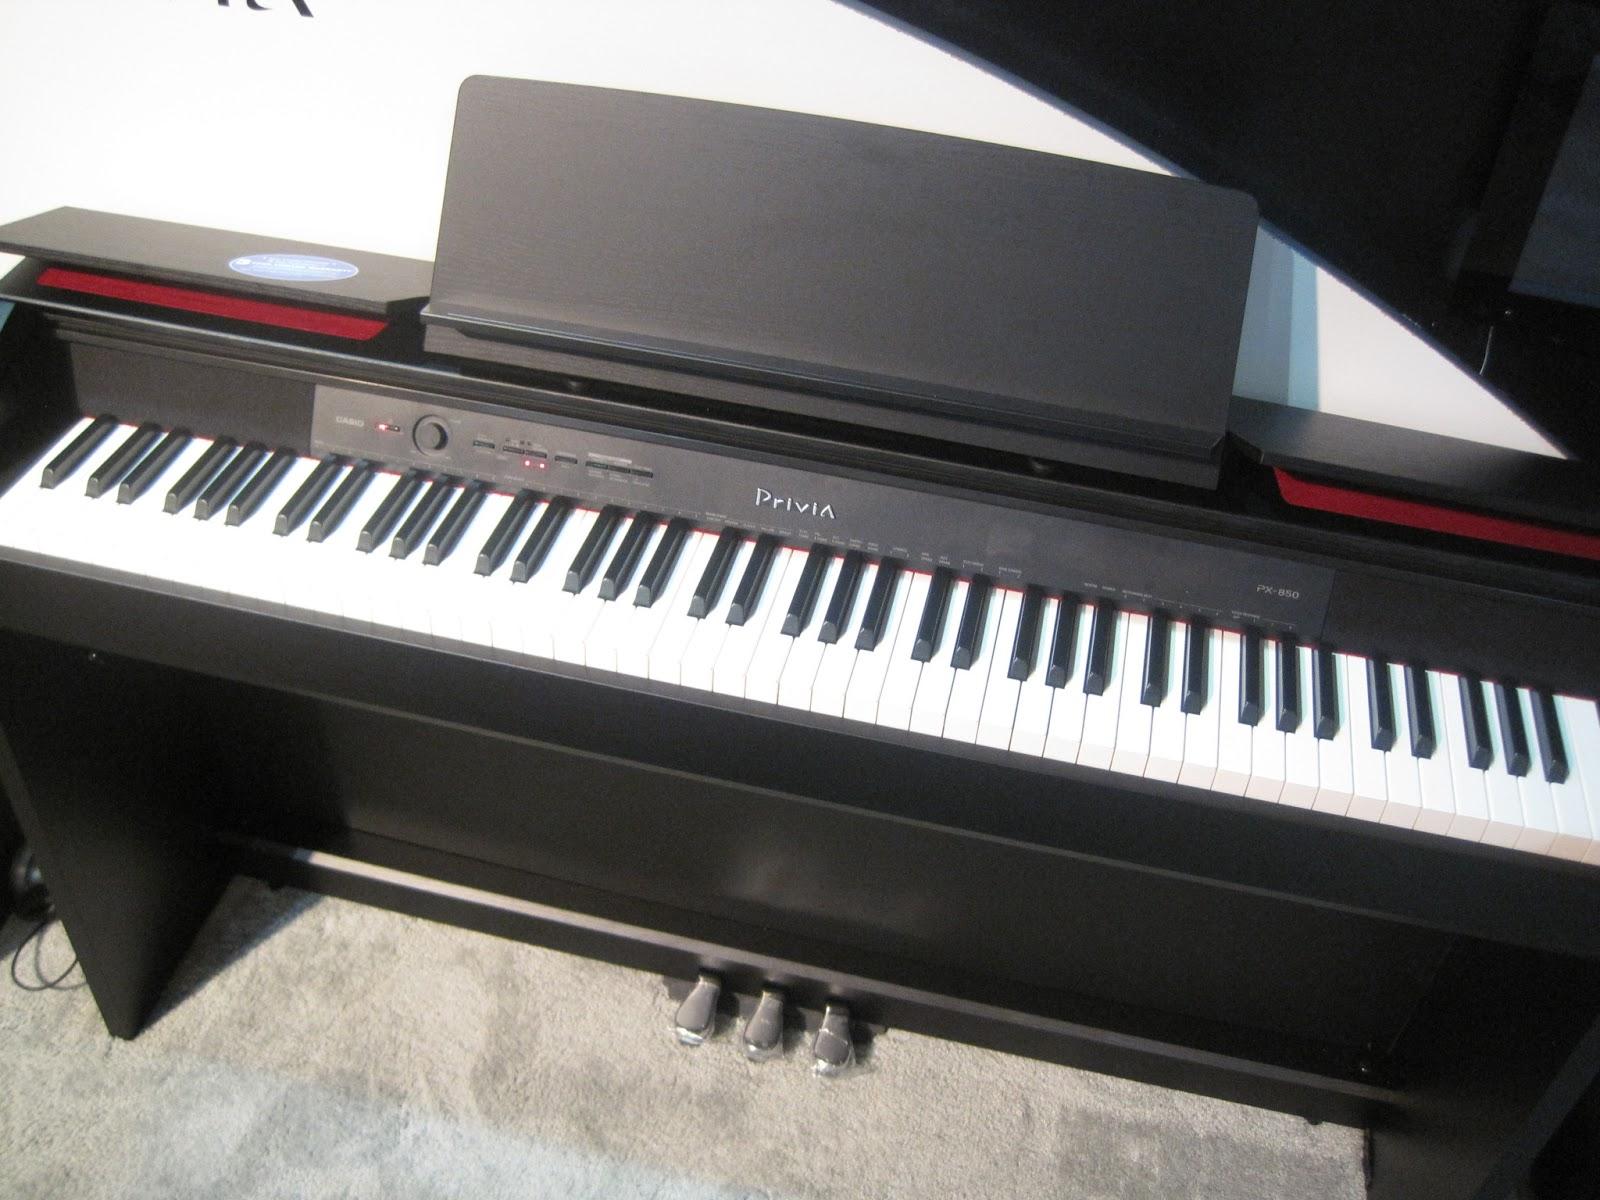 azpianonews review digital pianos under 2000 for 2014. Black Bedroom Furniture Sets. Home Design Ideas